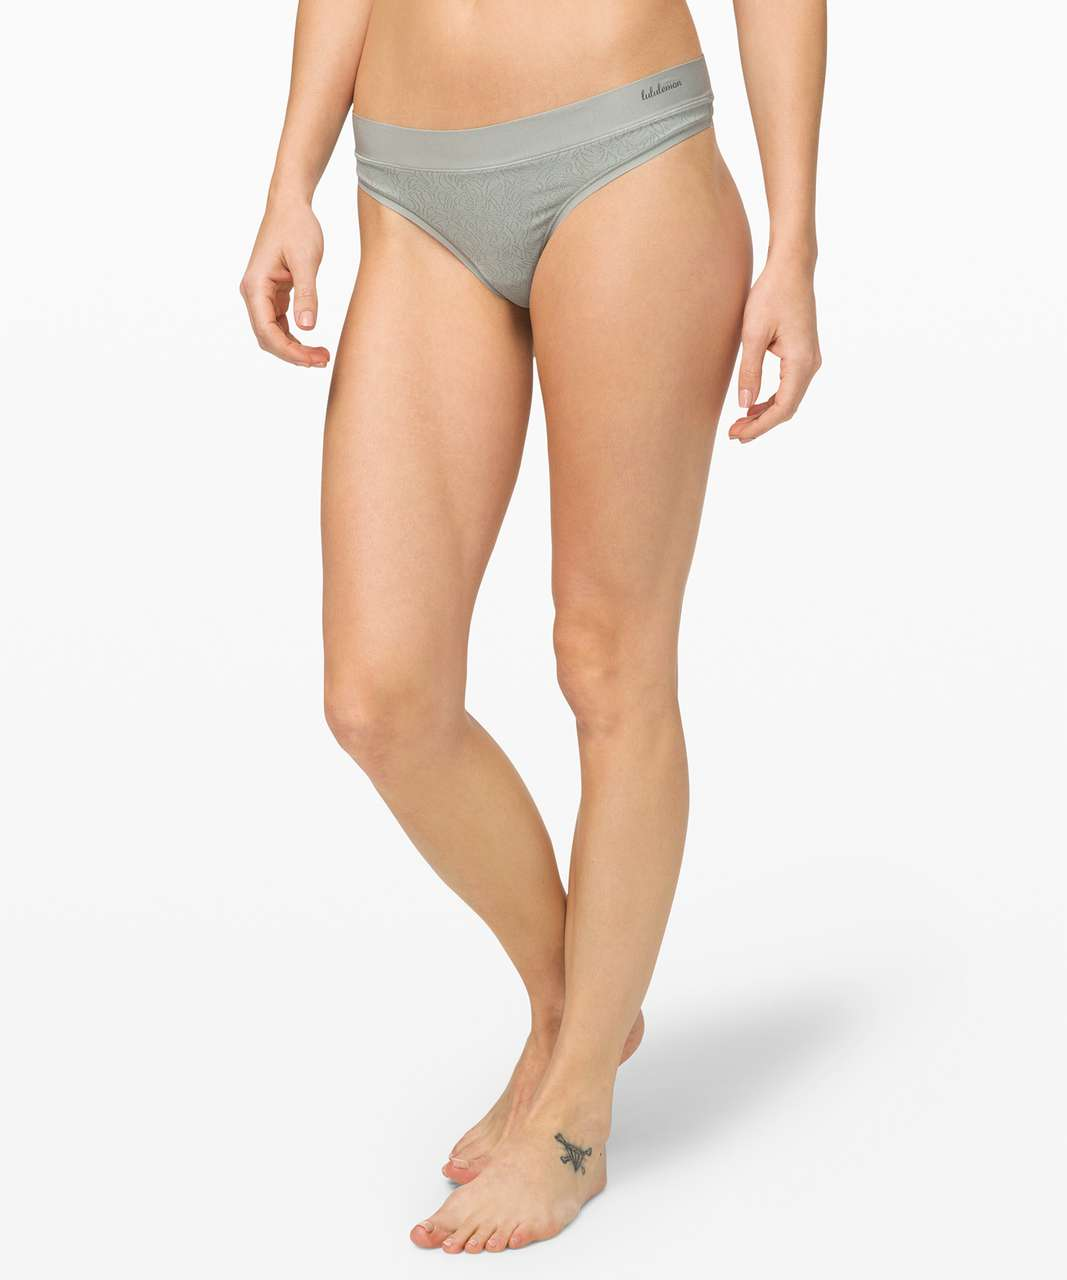 Lululemon Mula Bandhawear Thong *Lace - Jade Grey